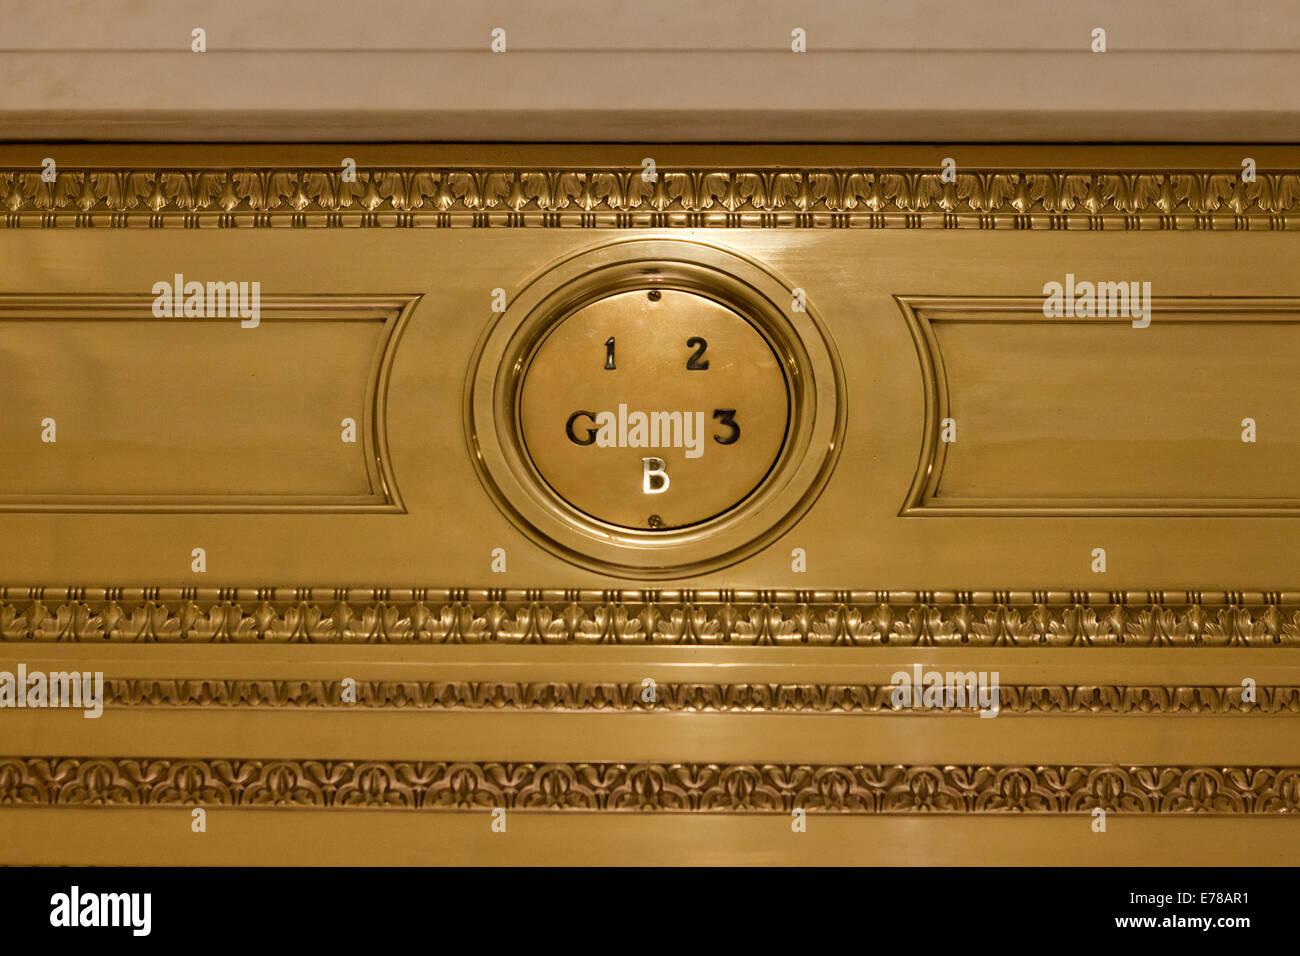 A vintage elevator floor level indicator at basement level - USA - Stock Image